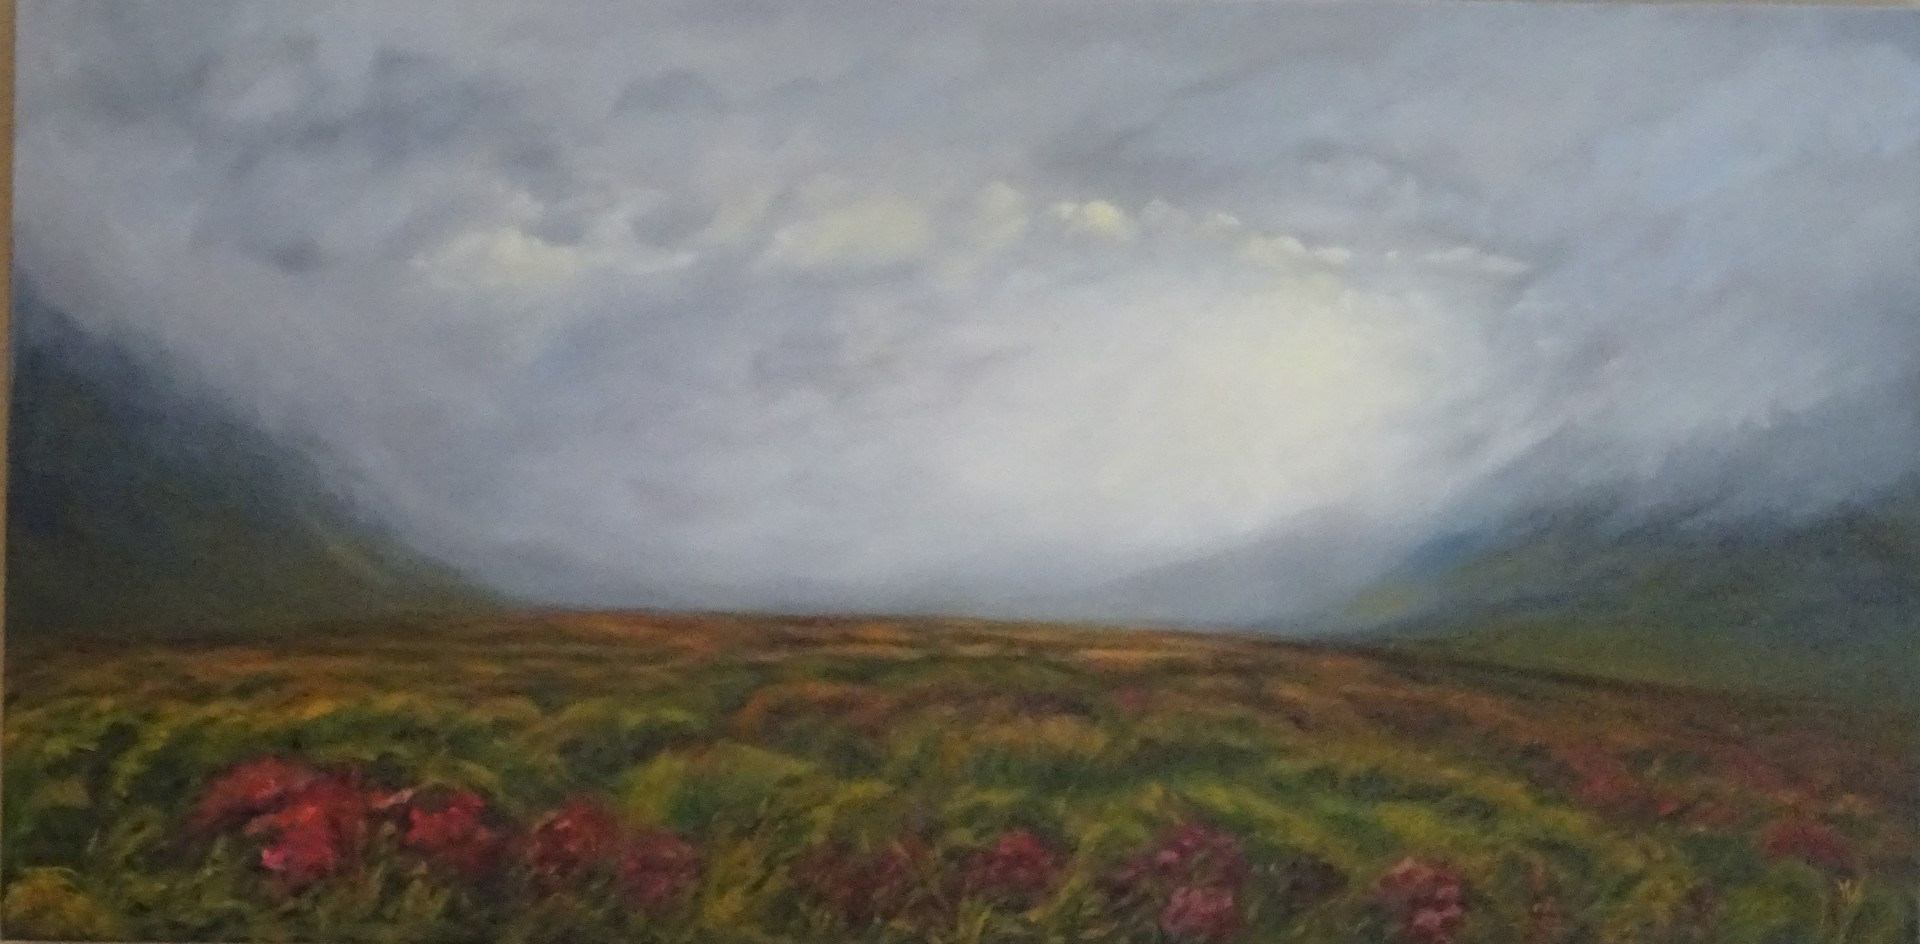 Heathered Valley